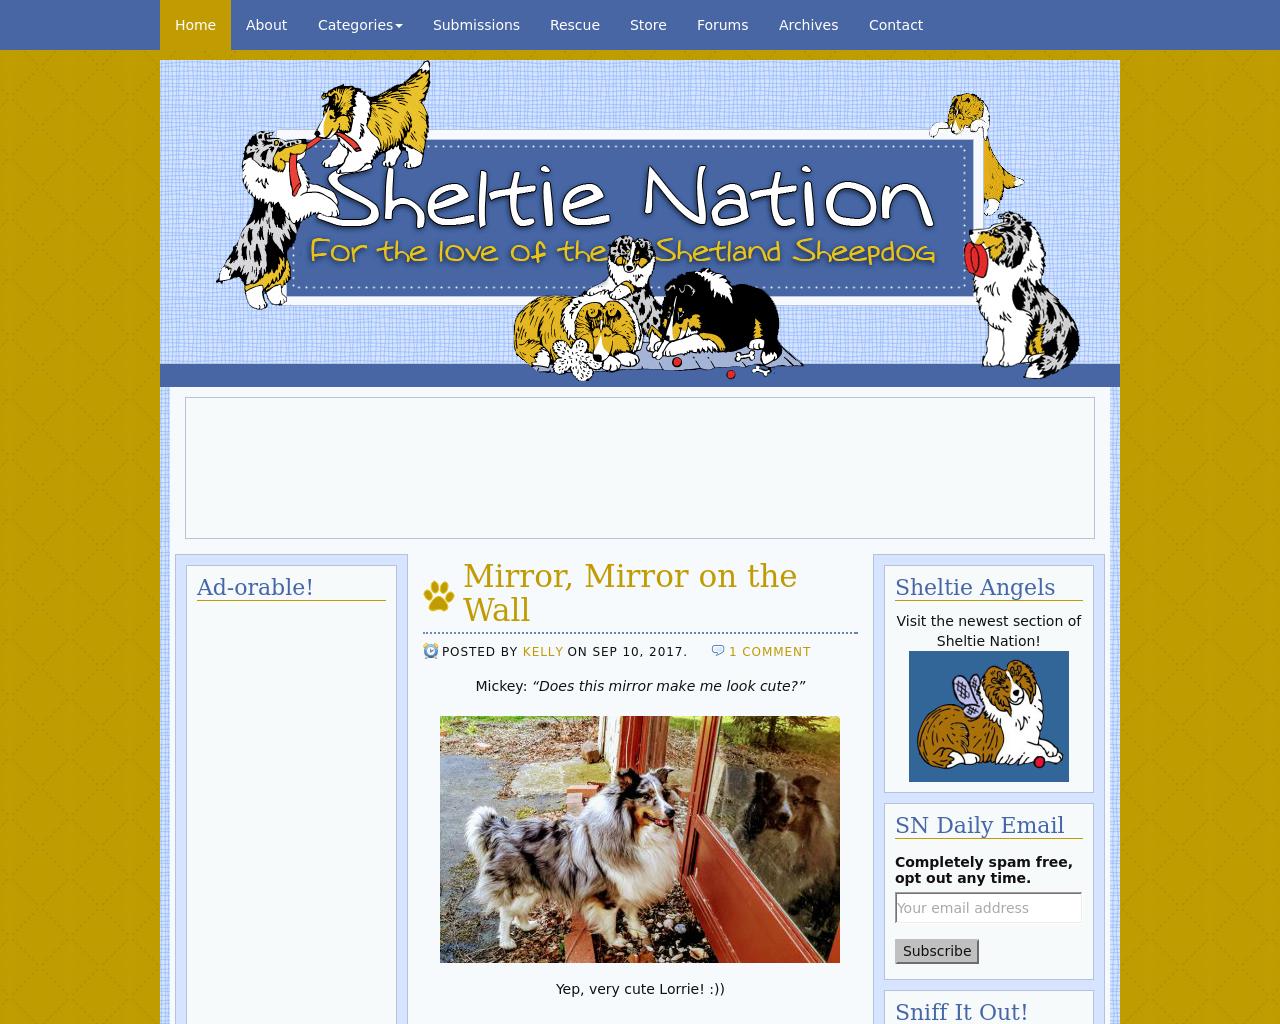 Sheltienation-Advertising-Reviews-Pricing